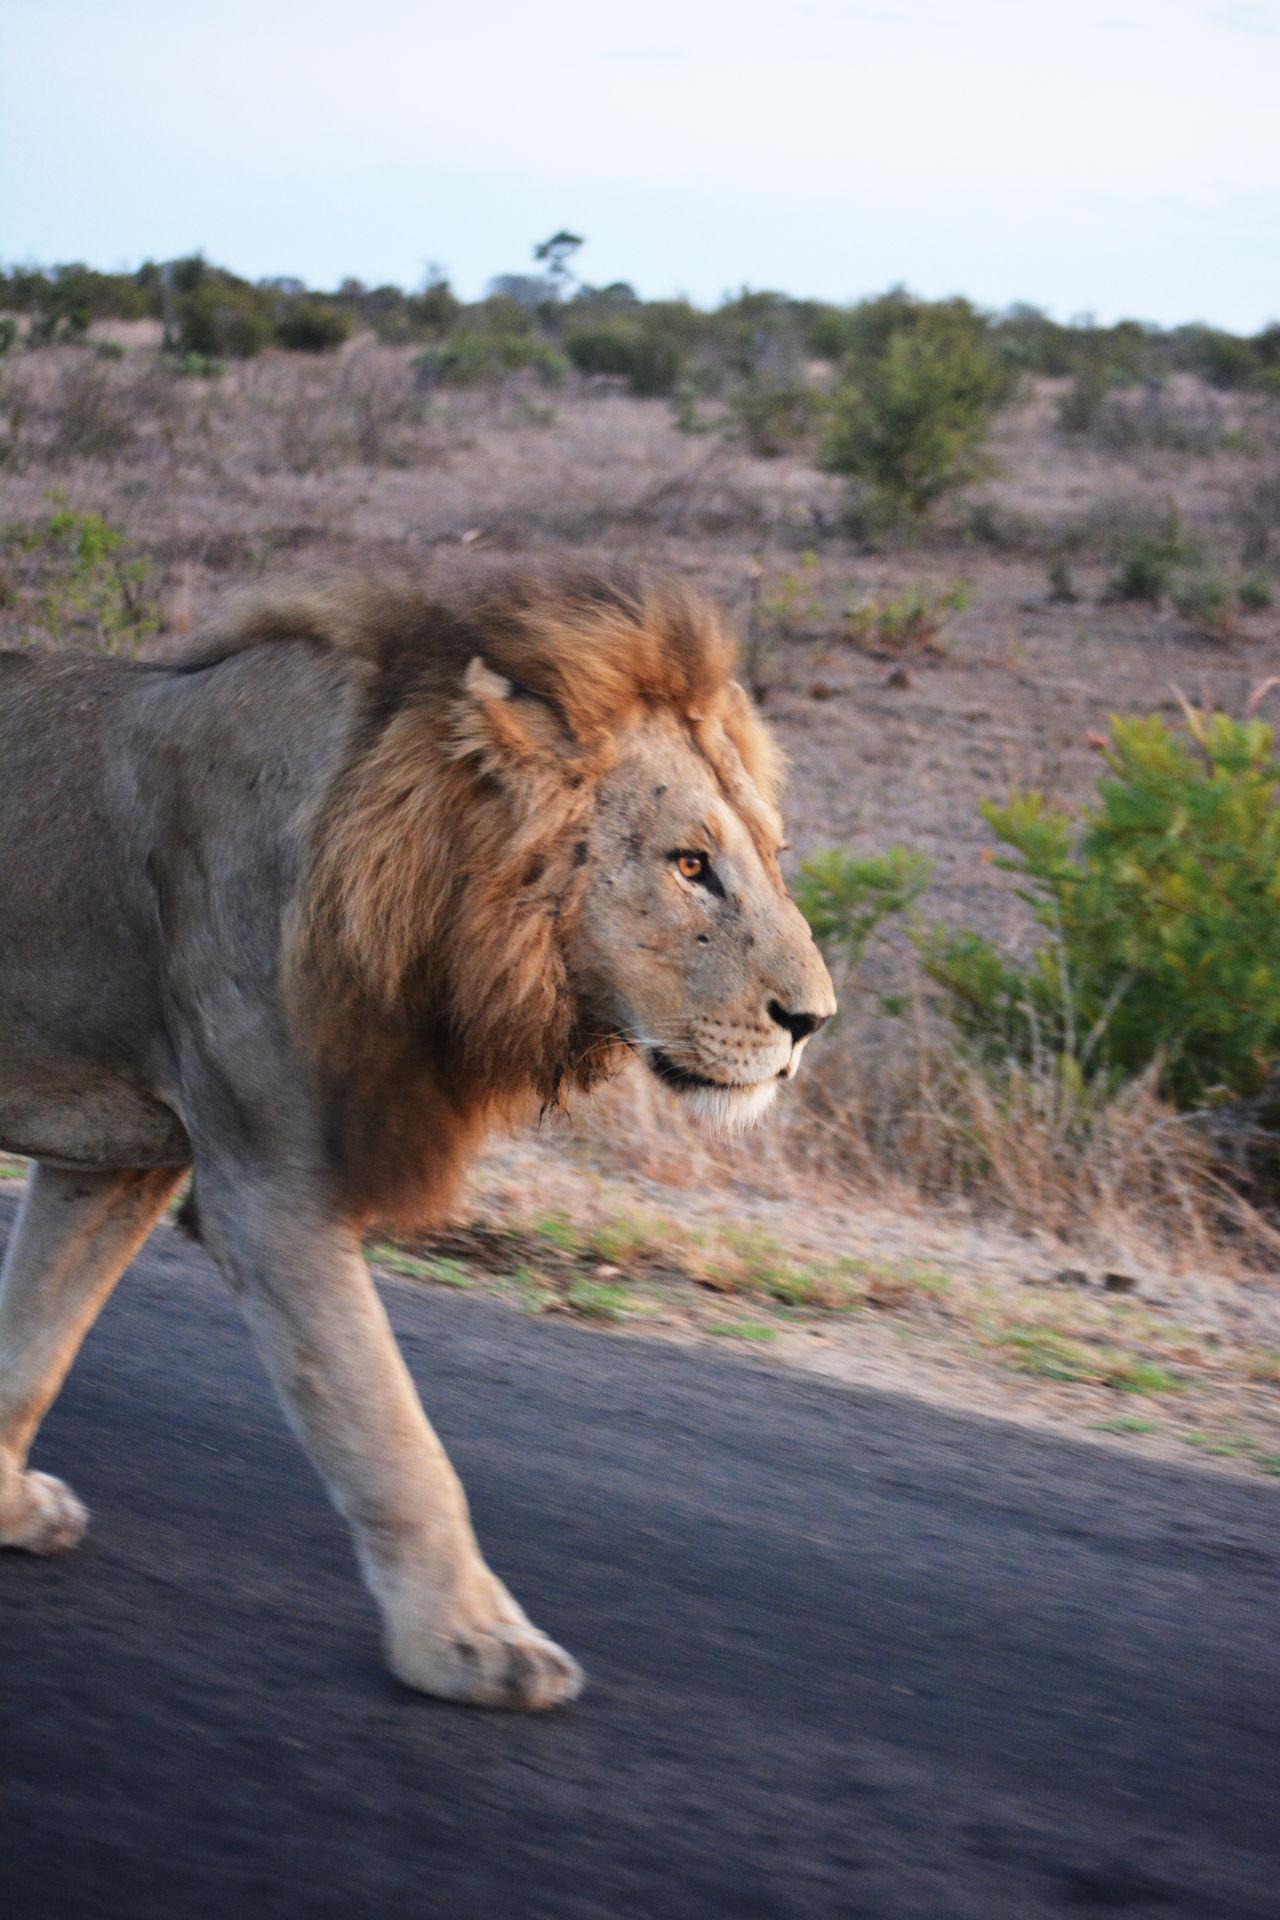 African Wildlife Big 5 Big Cat Big Cats Lion Lion - Feline Lions Wildlife Photography